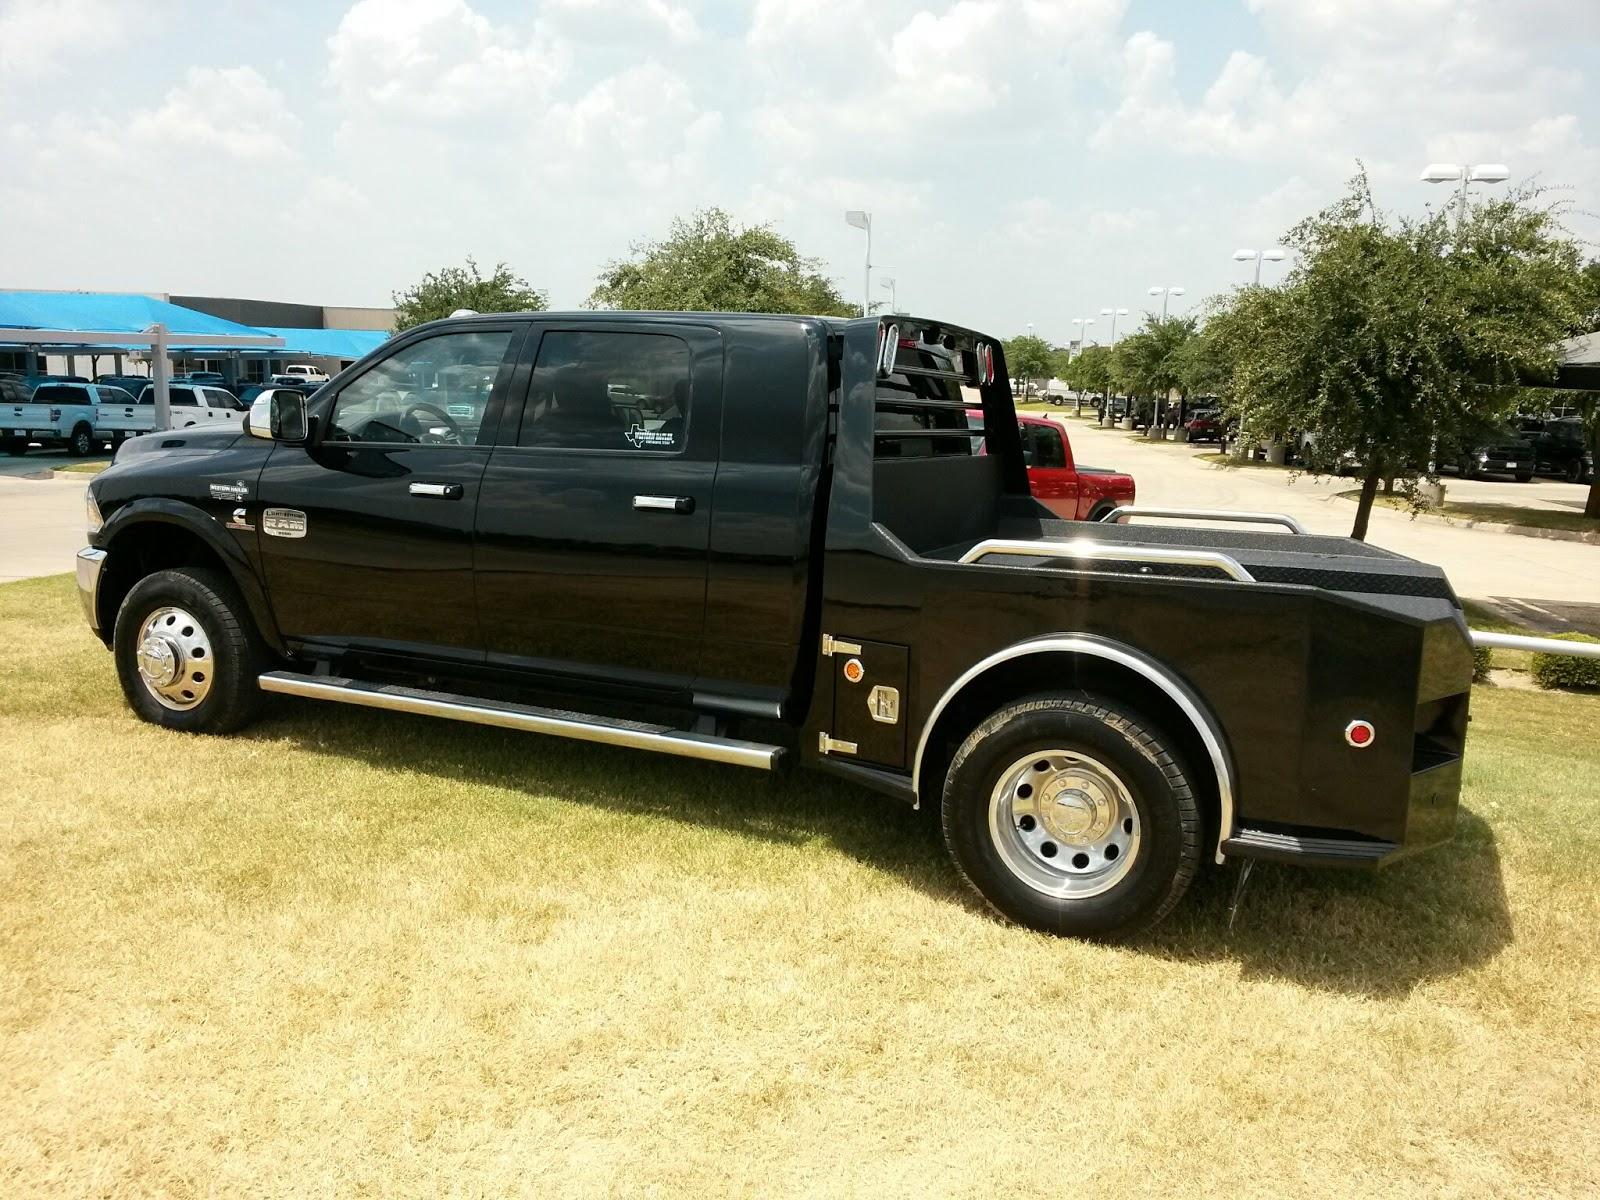 Lifted Trucks For Sale In Texas >> New Black 2015 Ram 3500 Laramie Longhorn Mega Cab 4x4 Western Hauler Flatbed TDY Sales 817-243 ...